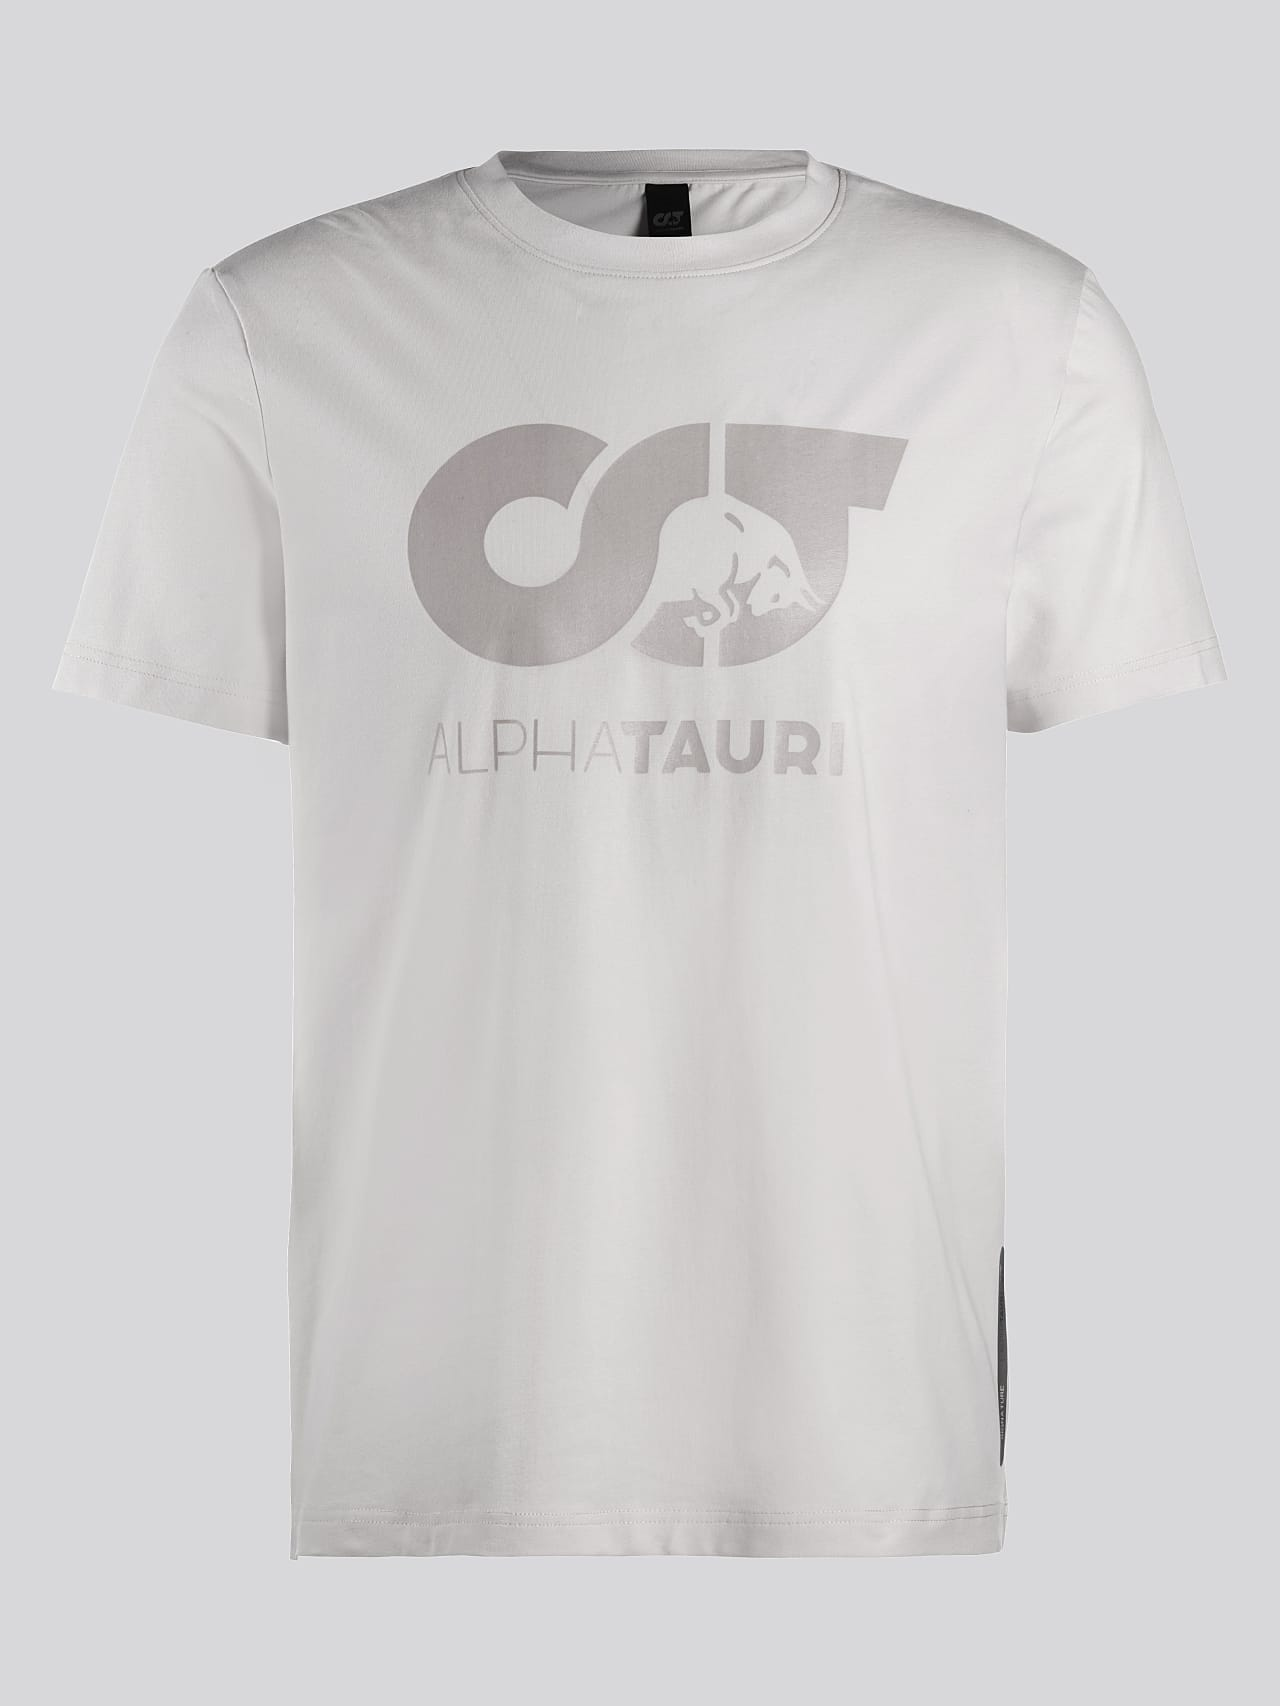 JERO V2.Y4.02 Signature Logo T-Shirt Sand Back Alpha Tauri